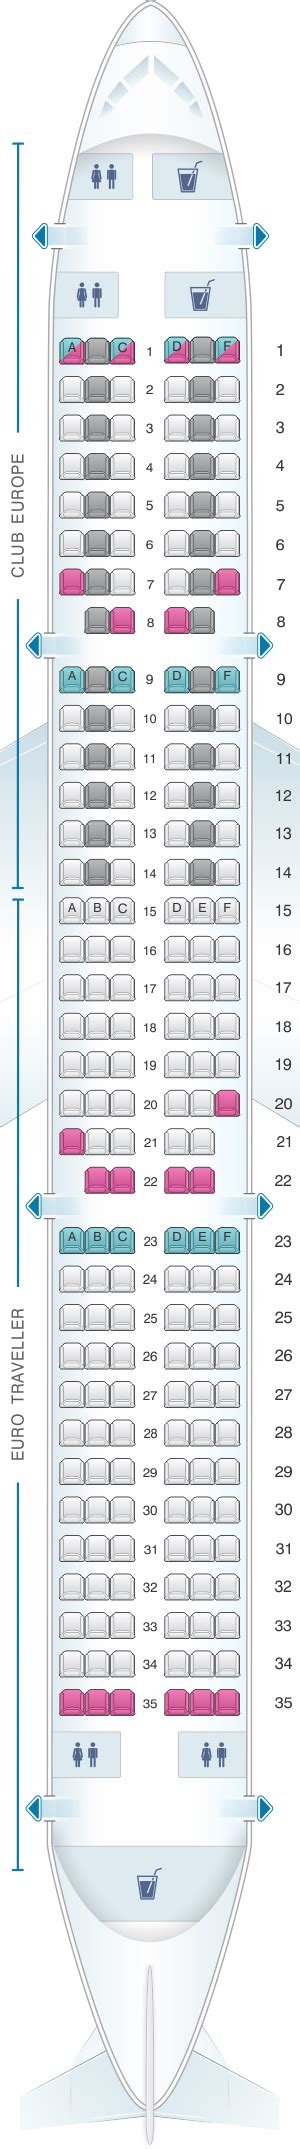 ba a321 seat map seat map airways airbus a321 european layout